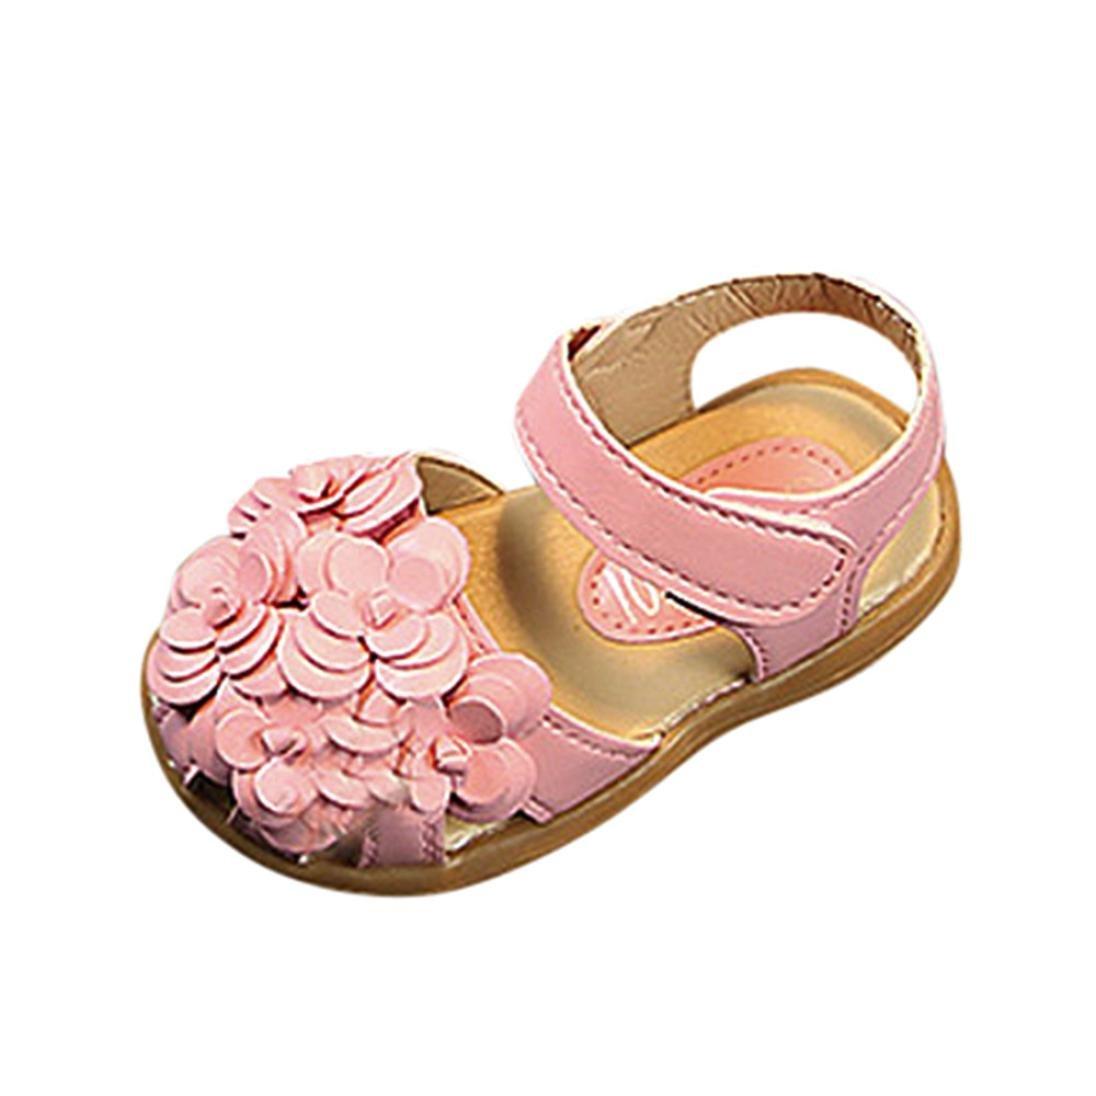 Zapatos Niña Bebé ❤ Amlaiworld Verano Sandalias de Cuero de niñas bebé Flor Zapatos de Princesa Sandalia de Playa Zapatilla de Chica Zapatos de bebé ...